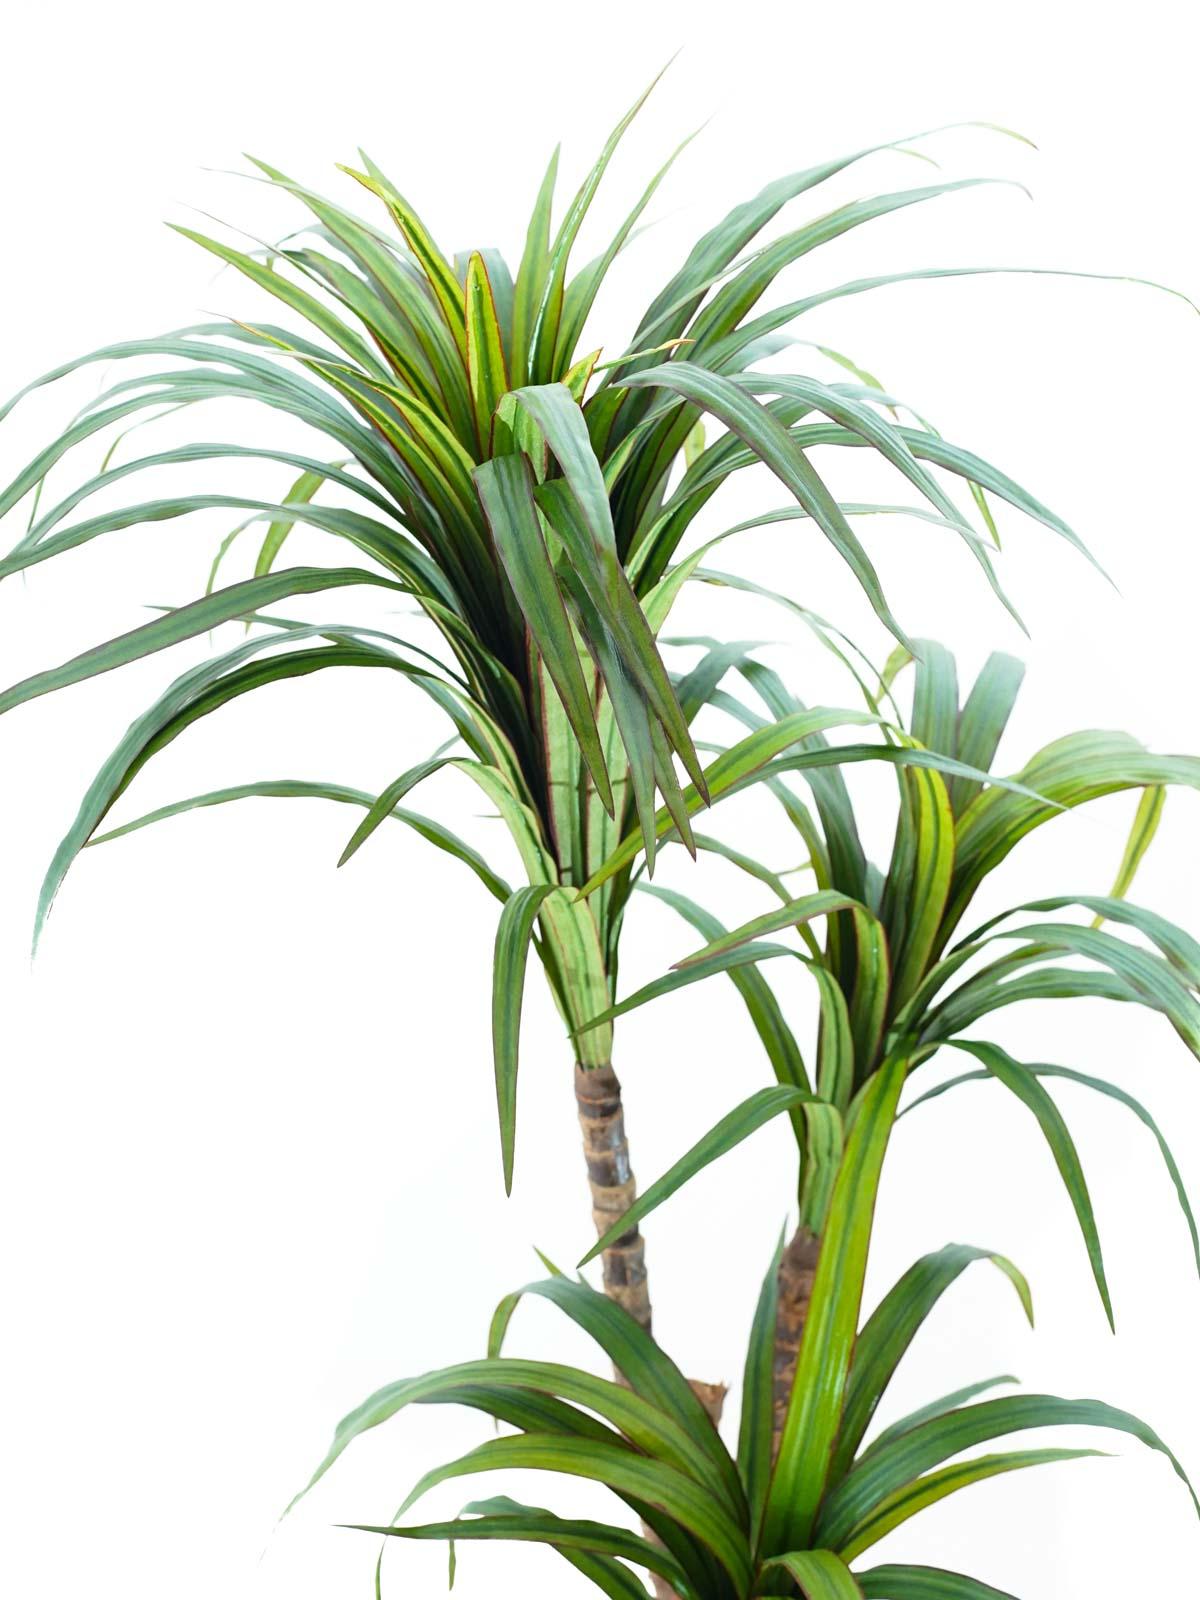 Dracaena Fragrans Tree Small Artificial Plants Hanging